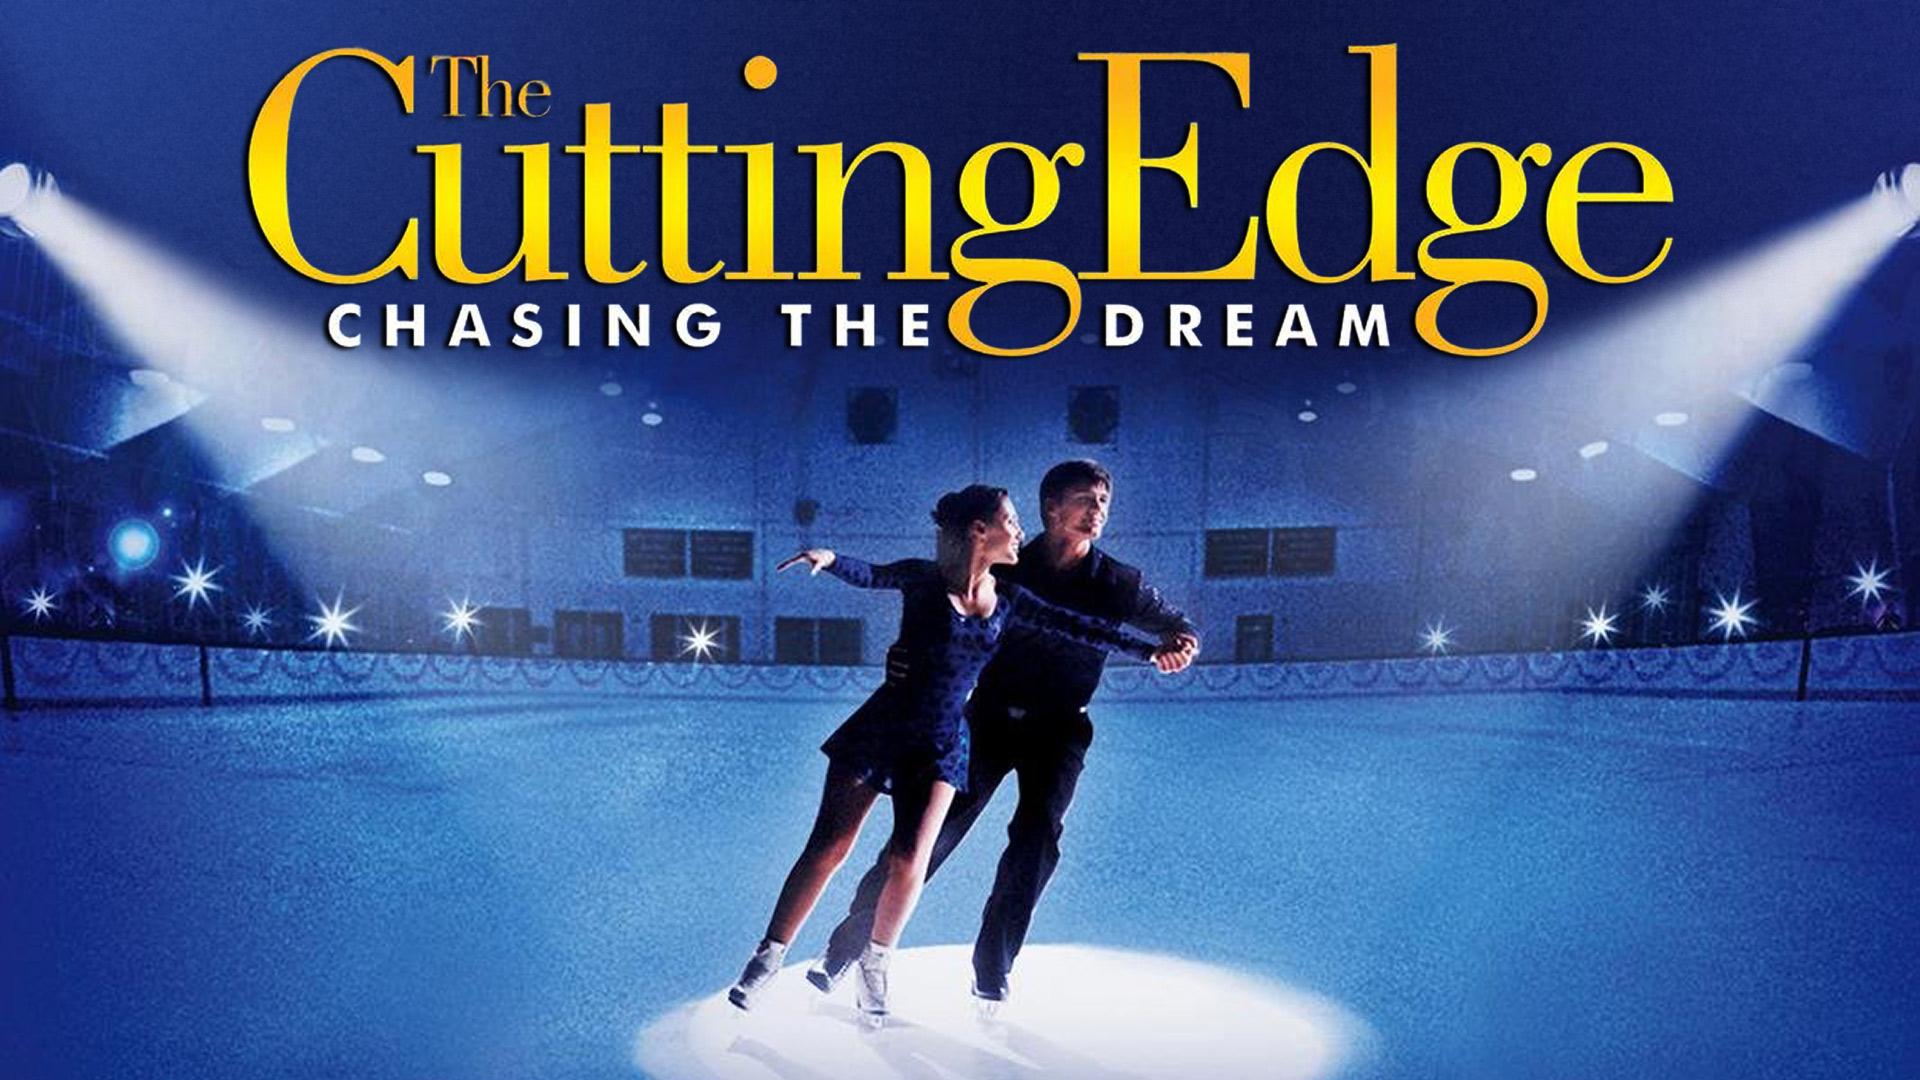 Cutting Edge 3: Chasing the Dream